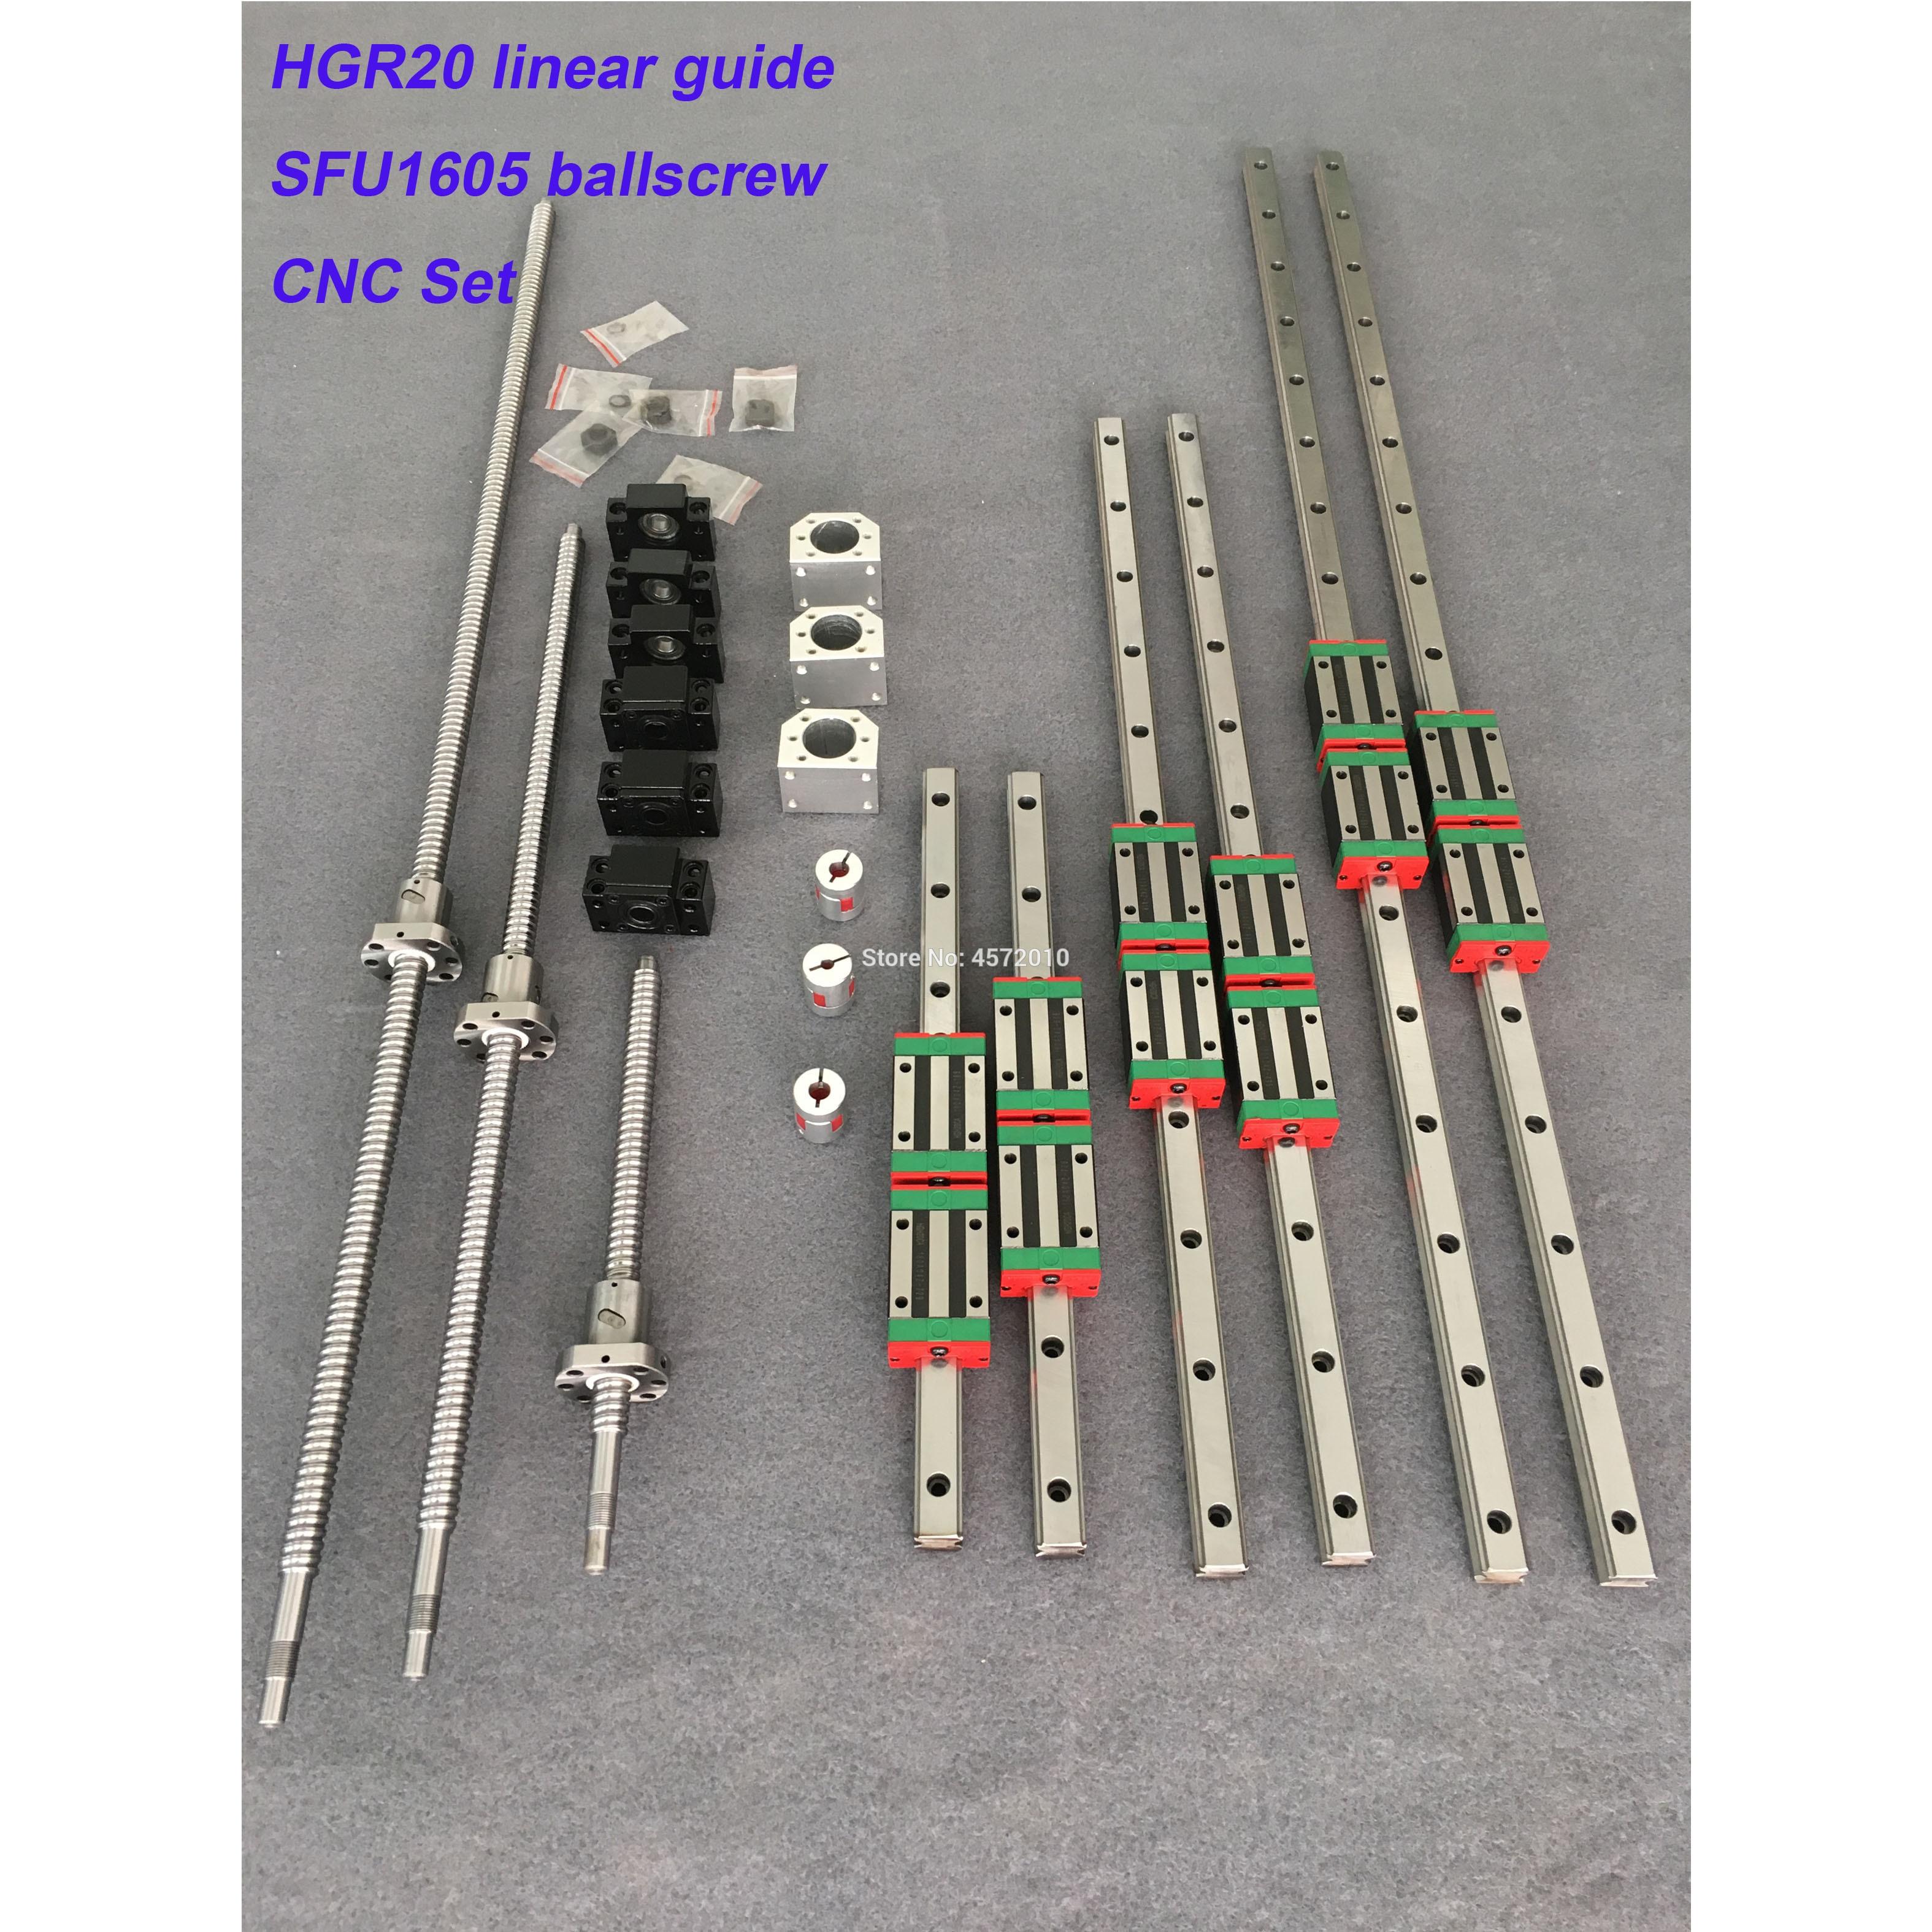 RU Delivery 6 set HGR20 - 400/700/1000mm Linear guide rail + SFU1605 - 400/700/1000mm Ballscrew + BK/BF12 + Nut housing CNC part